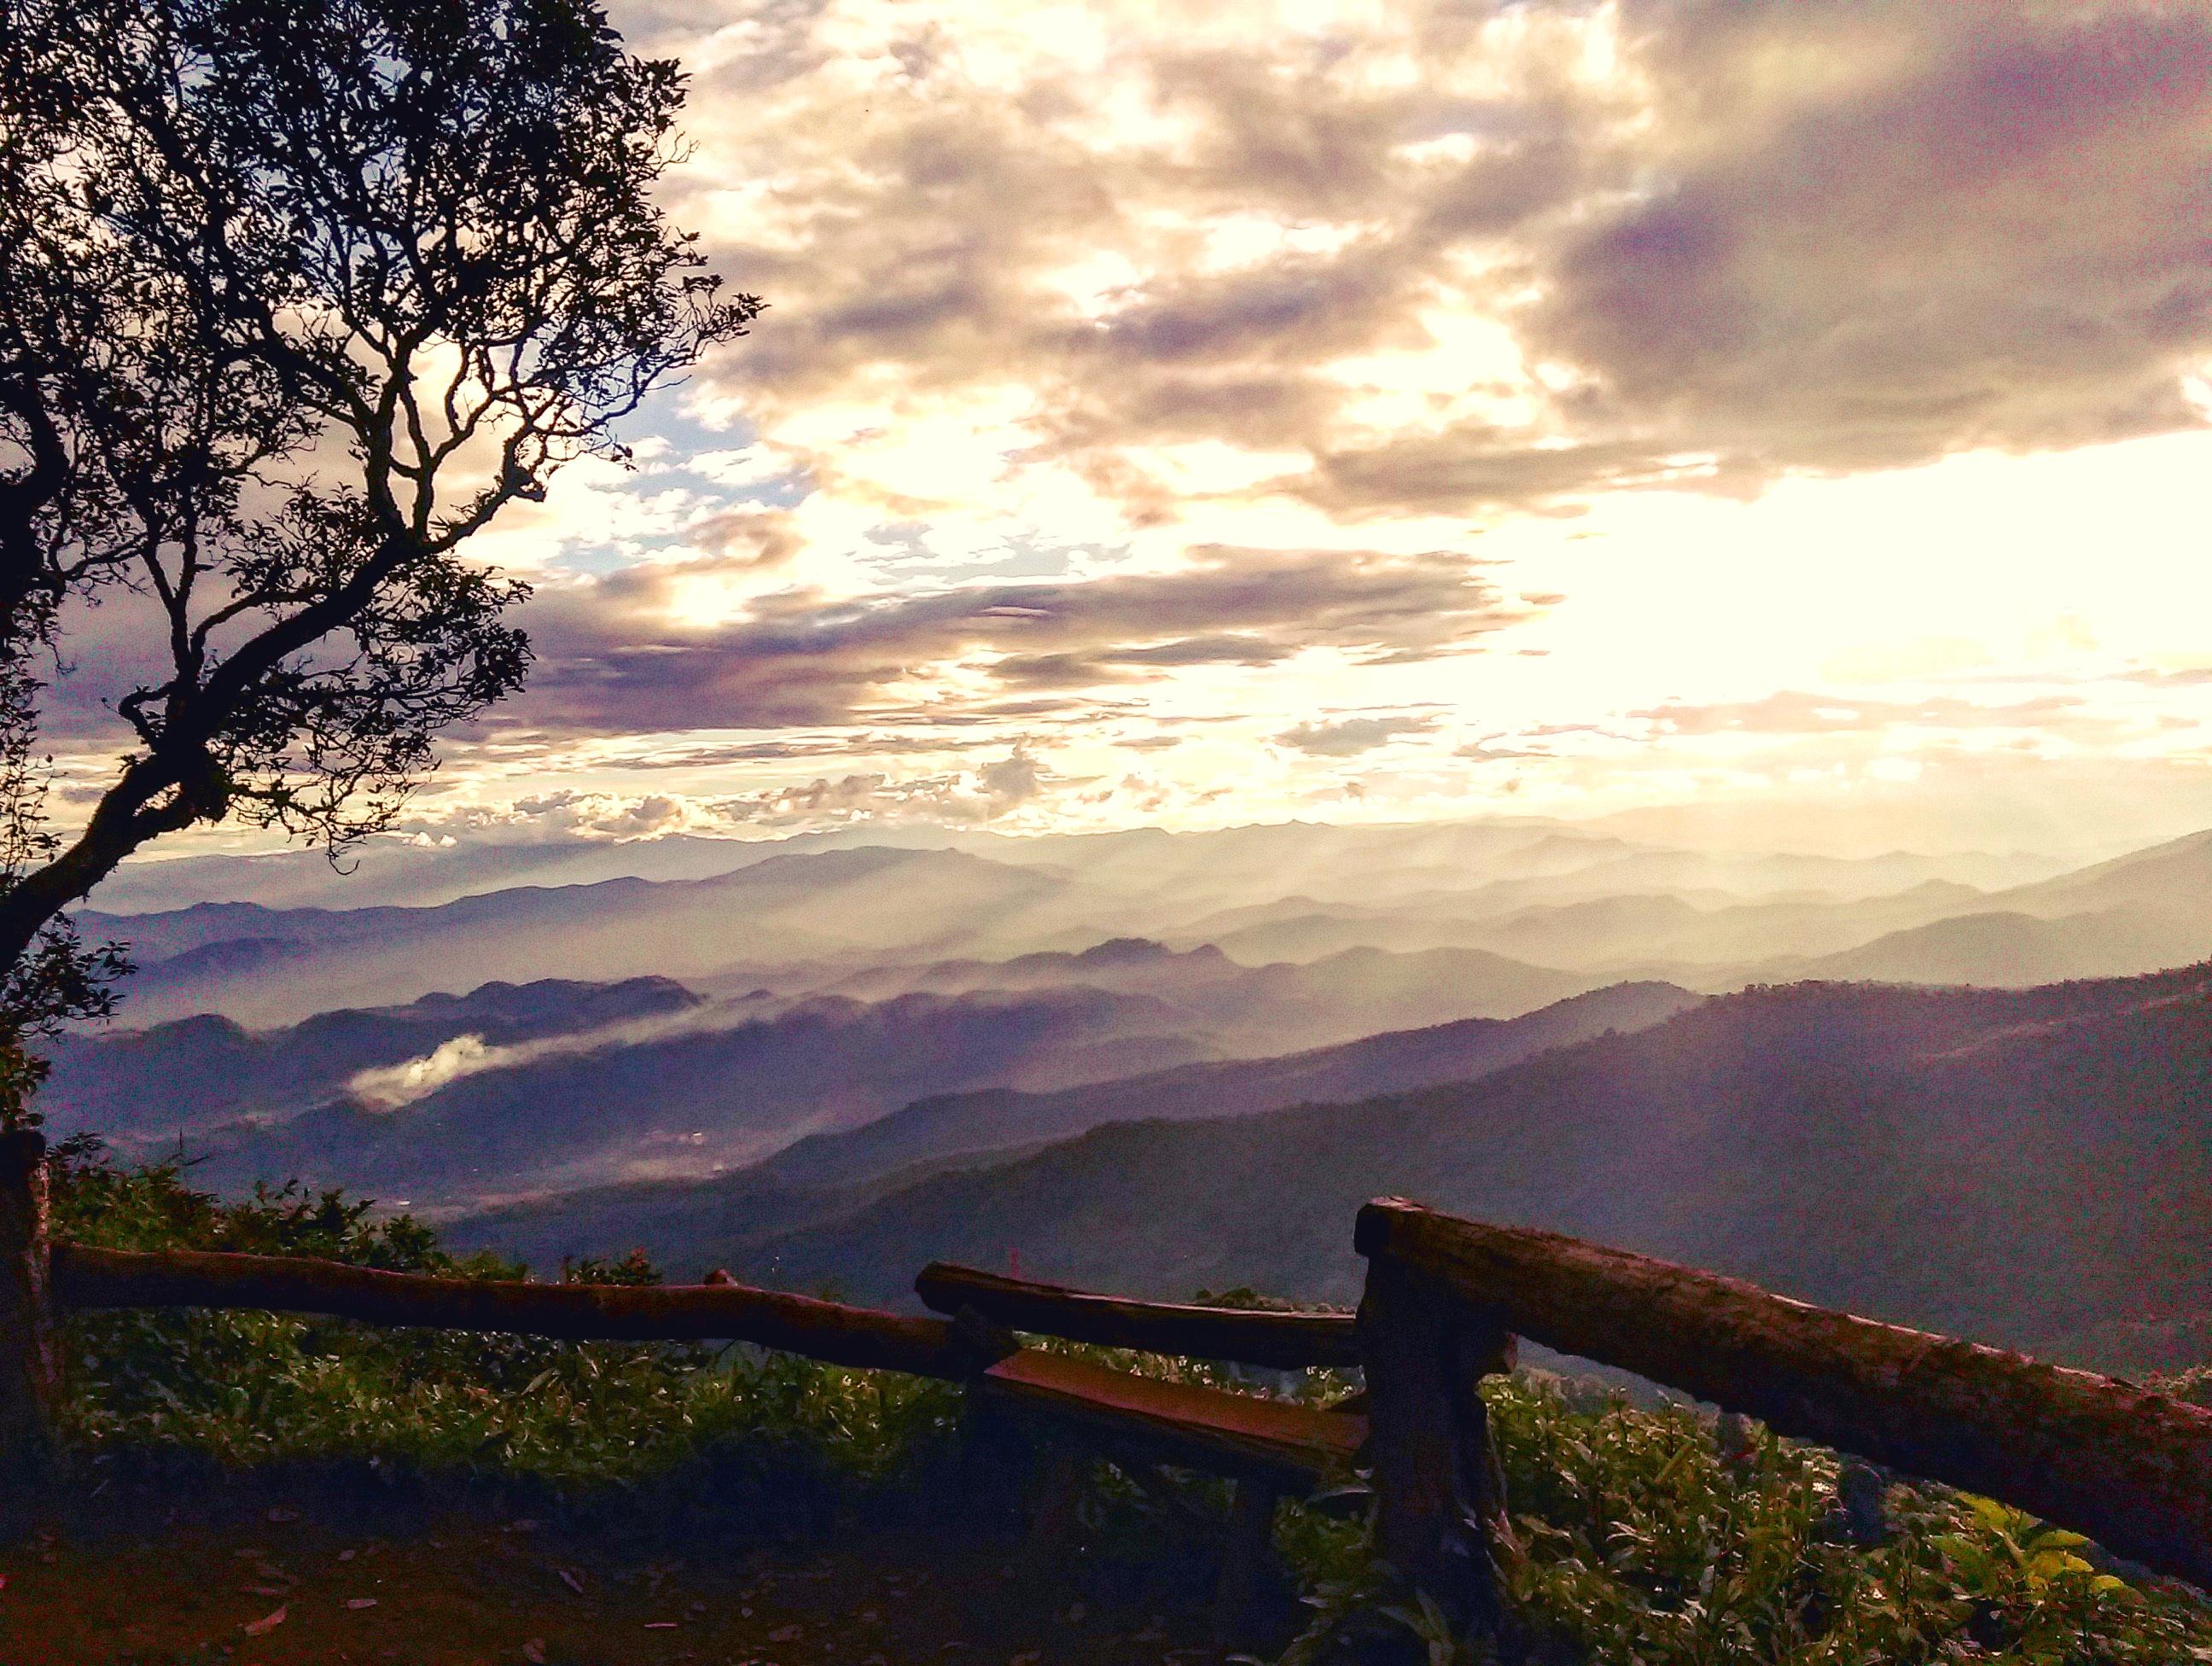 sunset doi pui viewpoint chiang mai